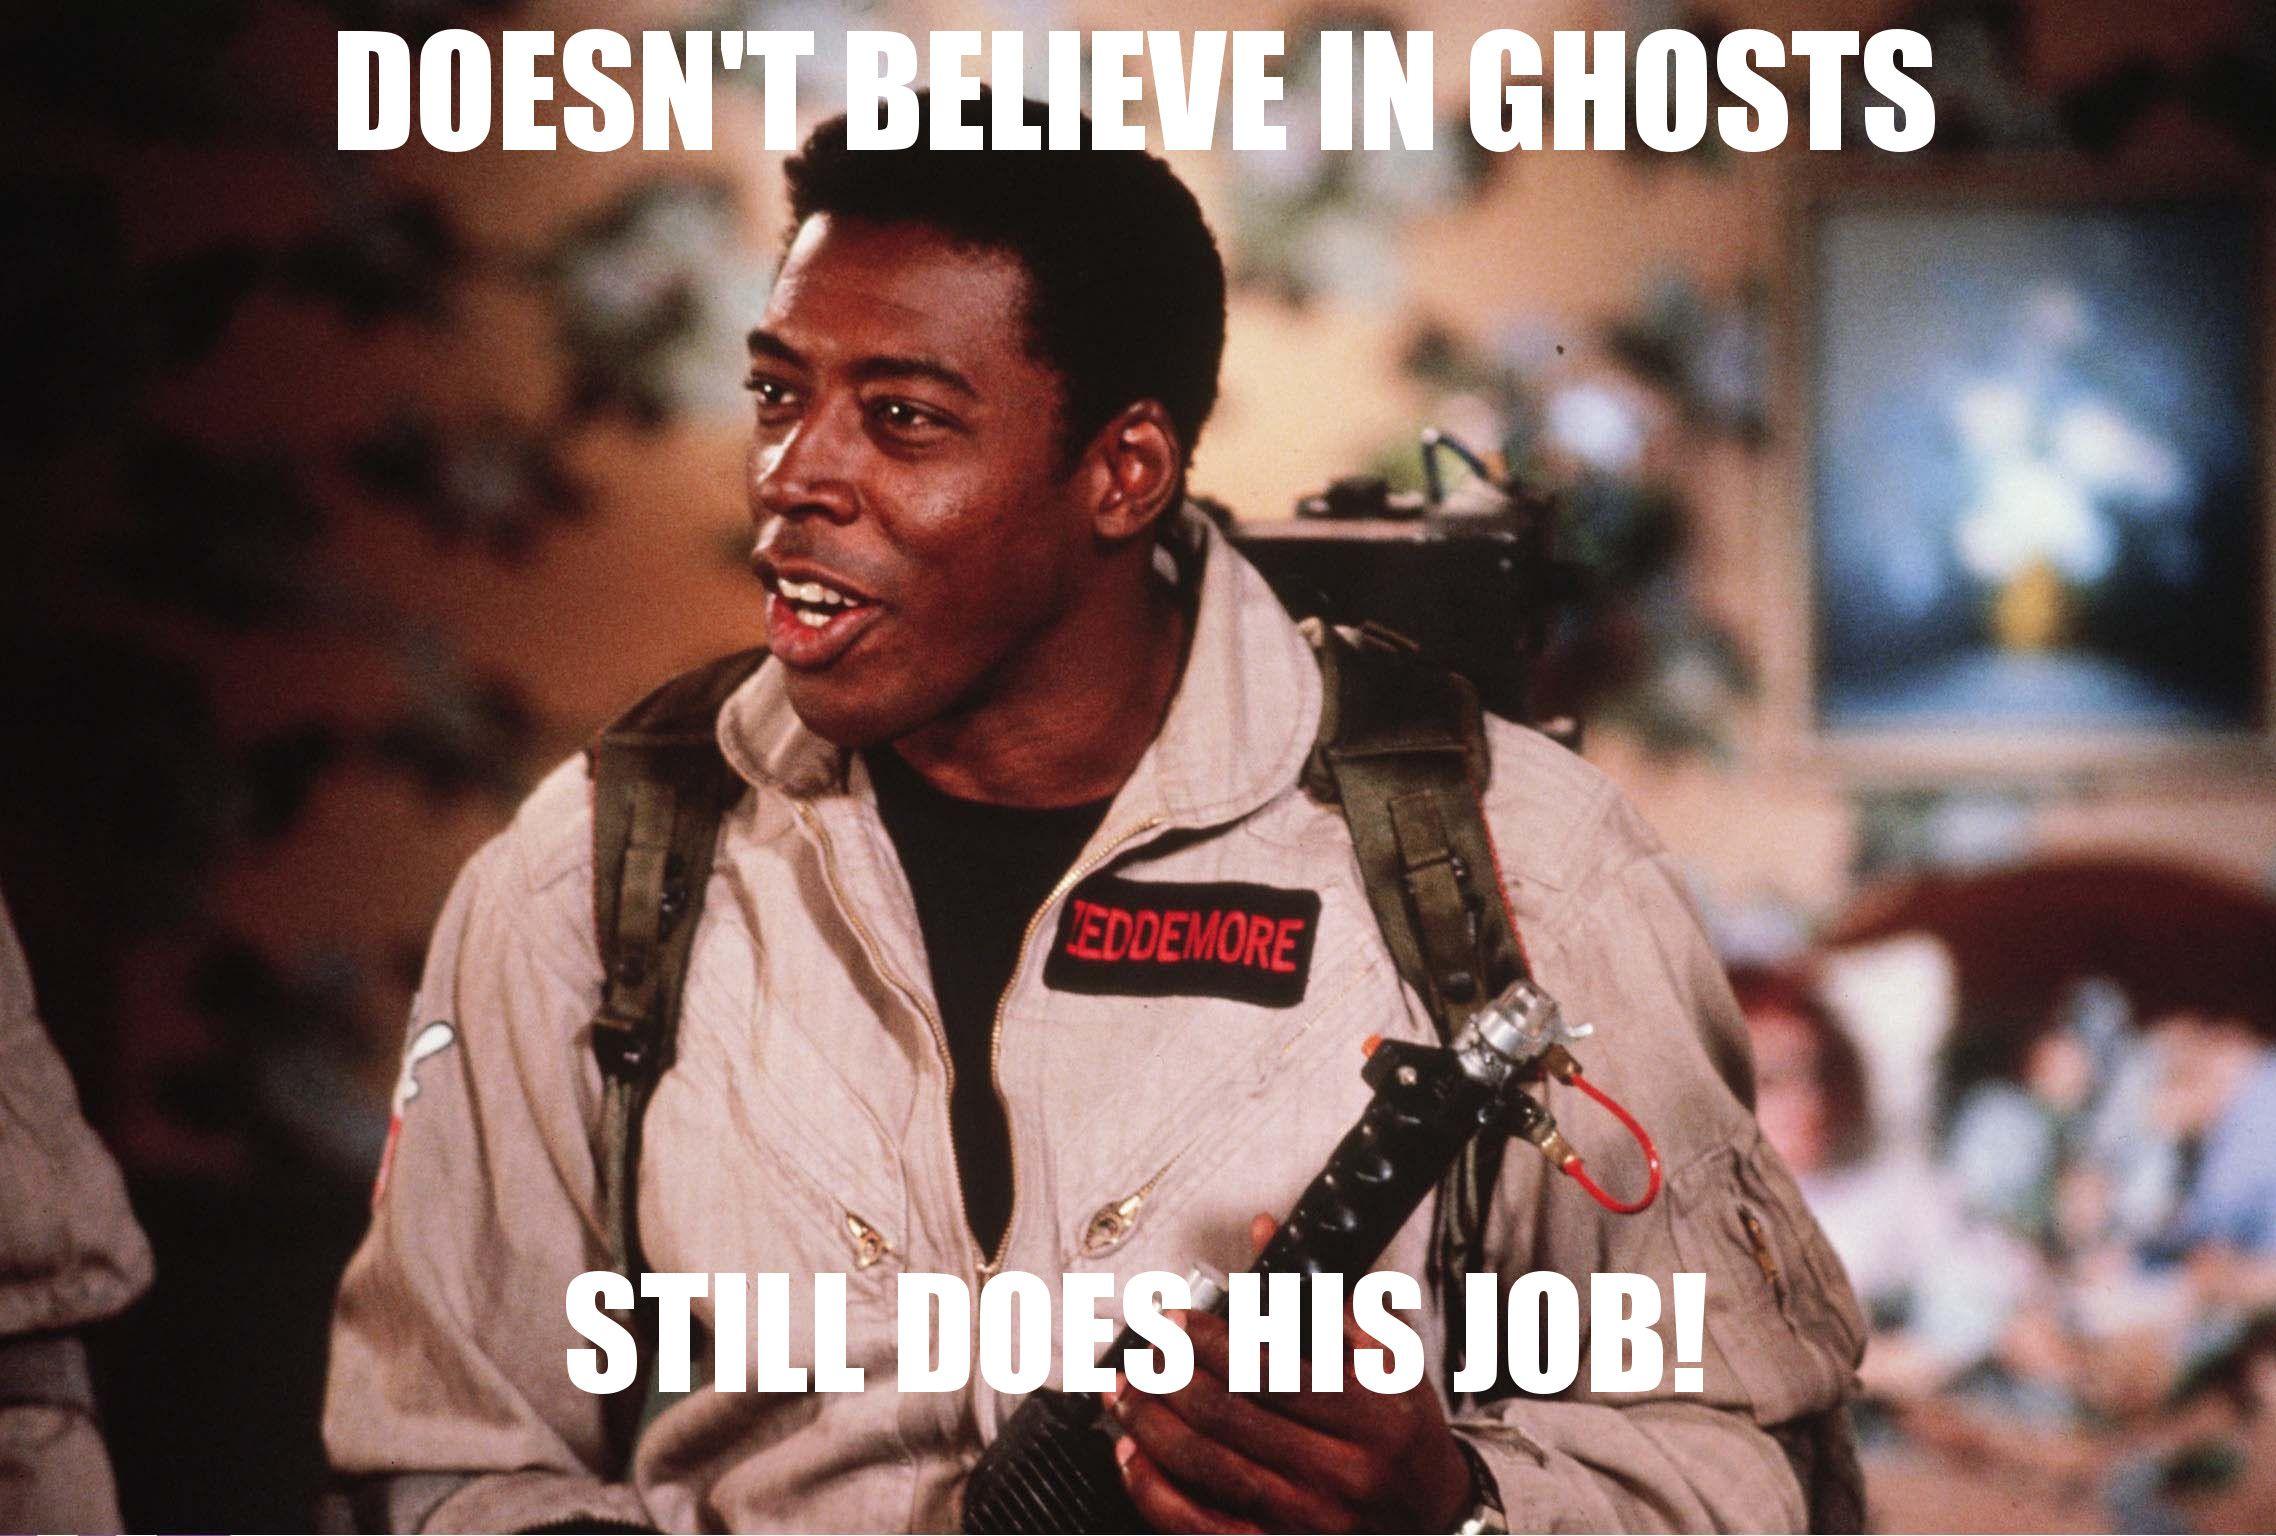 #Ghostbusters (1984)  #Winstonzeddemore